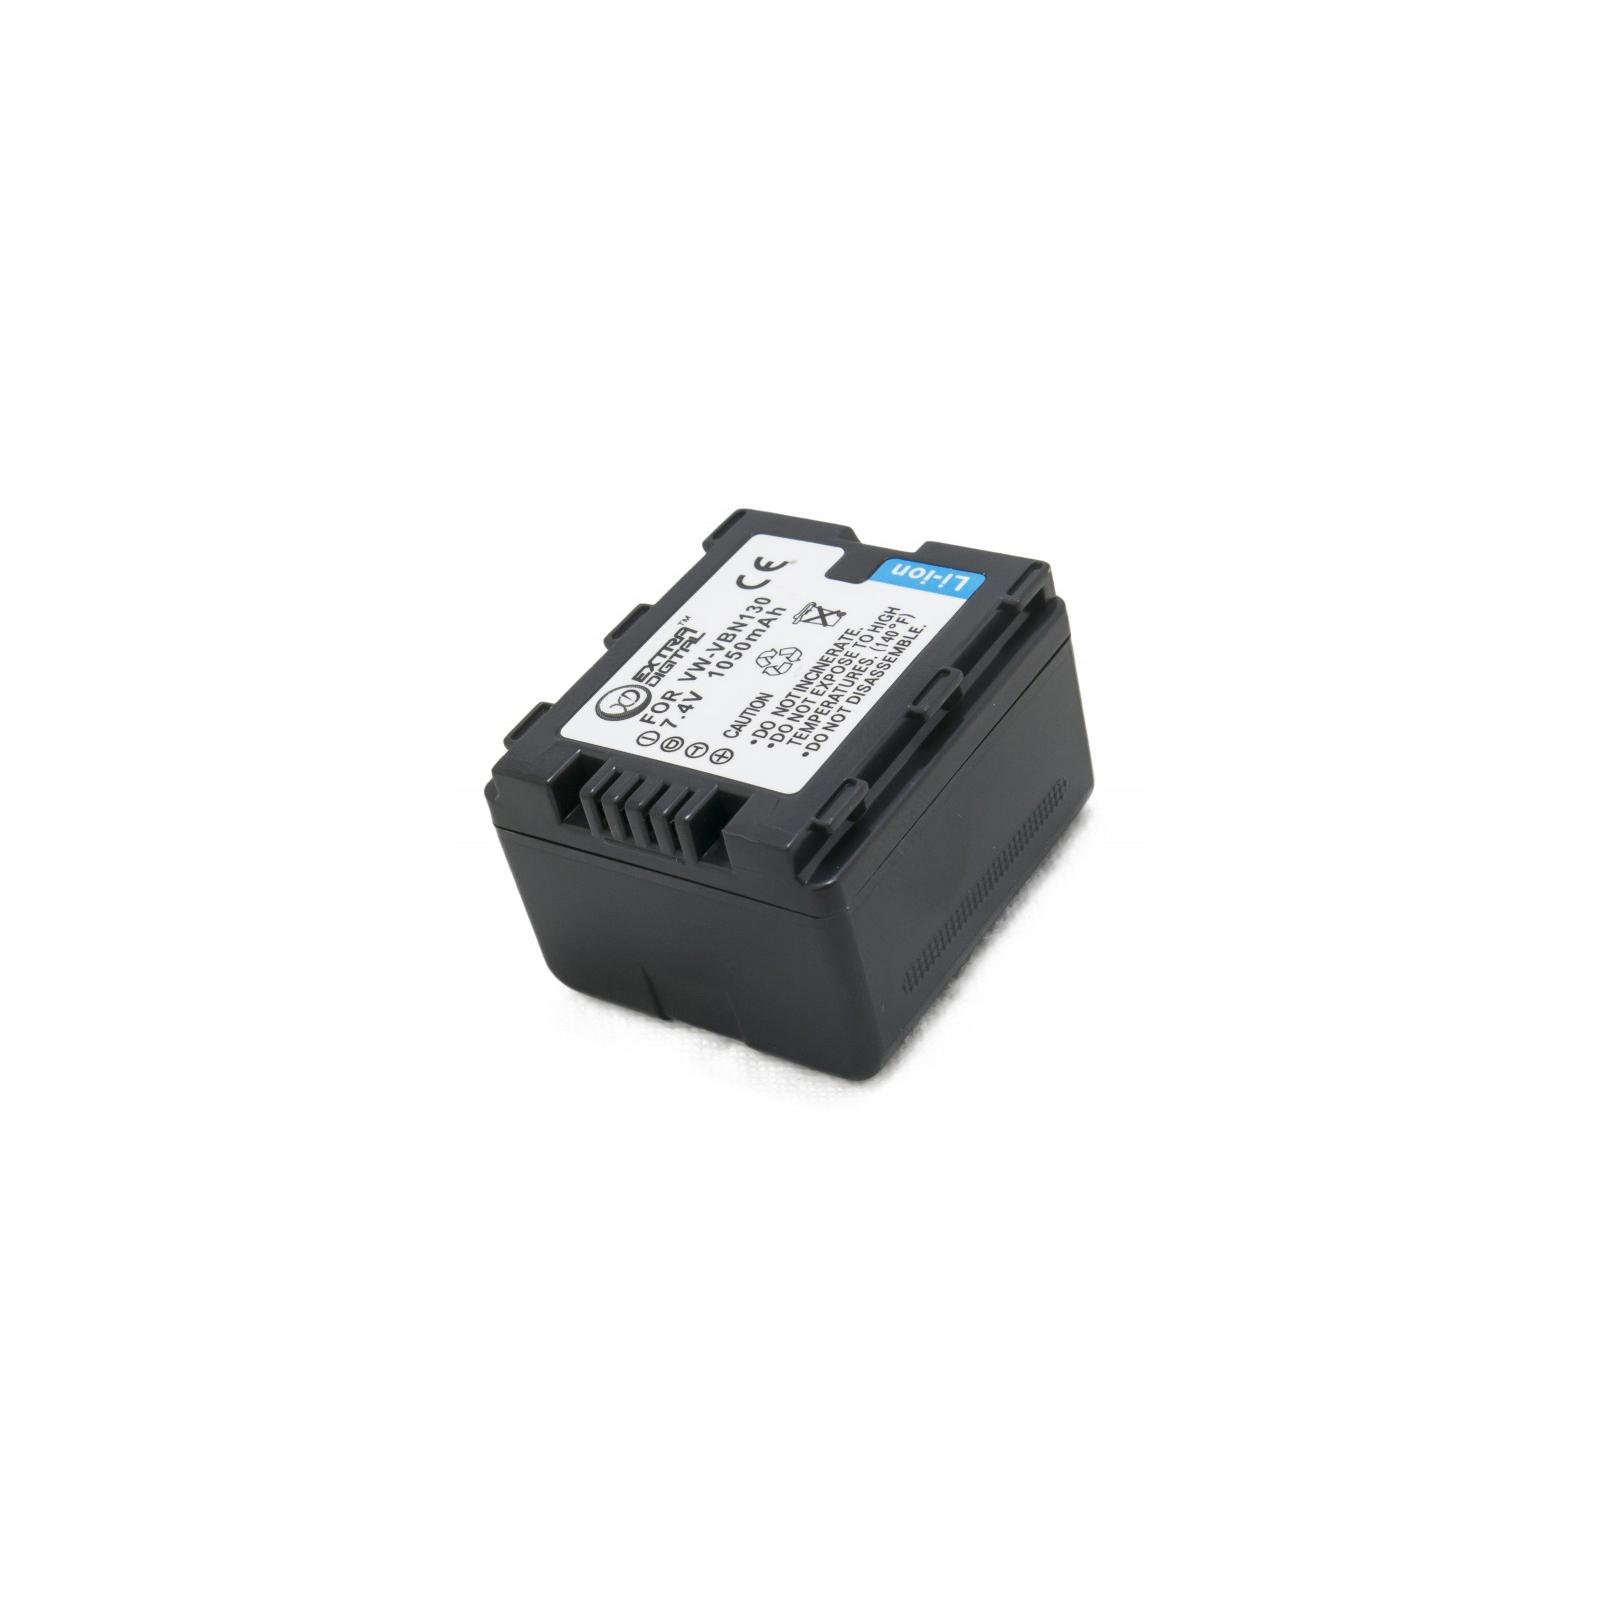 Аккумулятор к фото/видео EXTRADIGITAL Panasonic VW-VBN130 (DV00DV1361) изображение 4